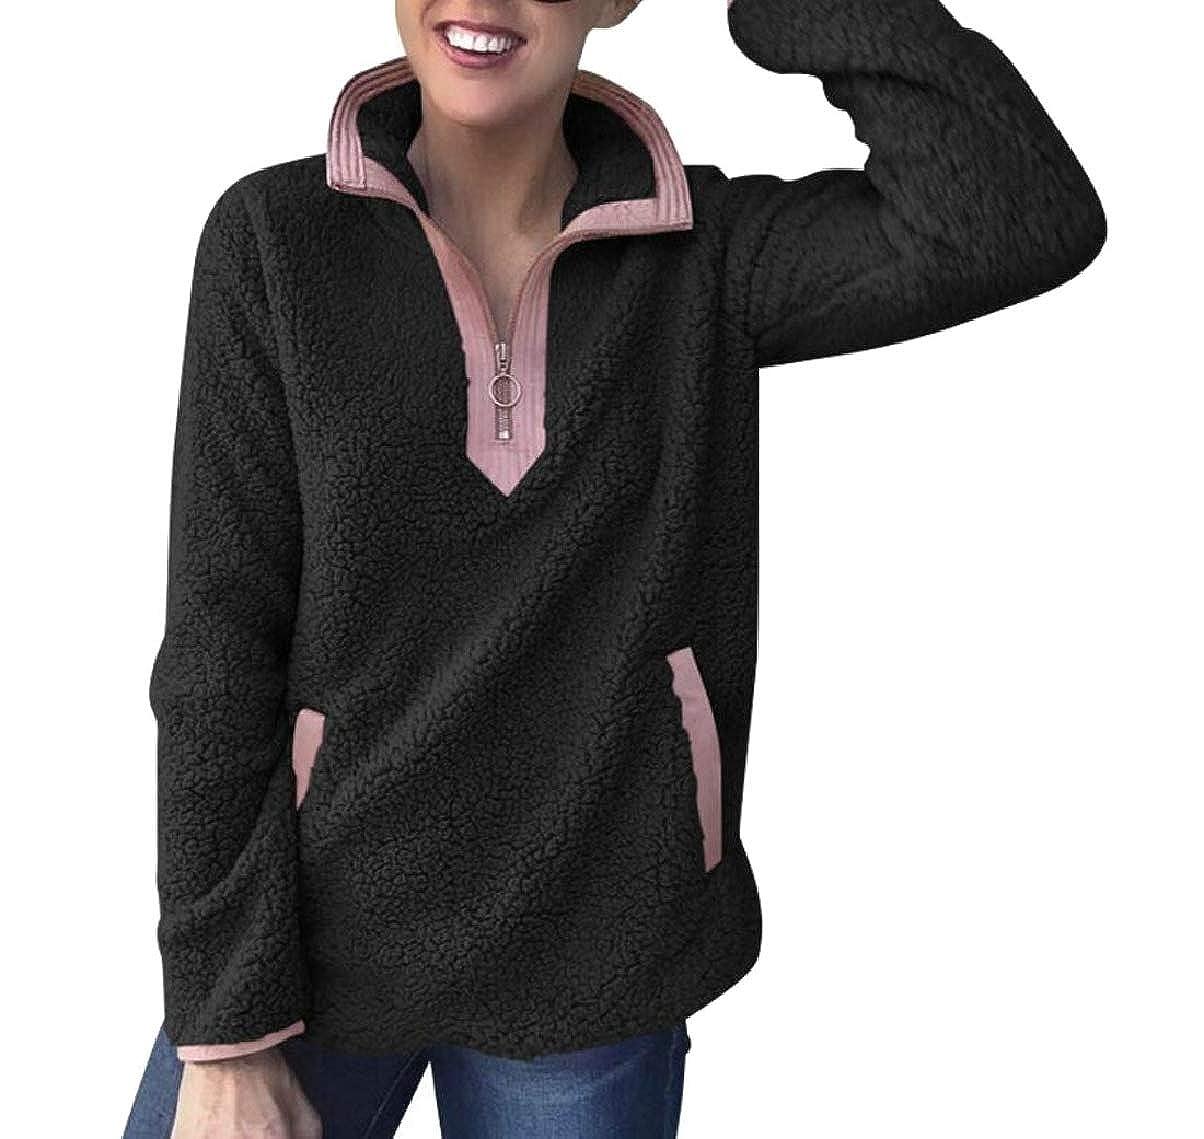 ZXFHZS Womens Fashion Long Sleeve Zipper Fleece Pullover Sweatshirt with Pockets